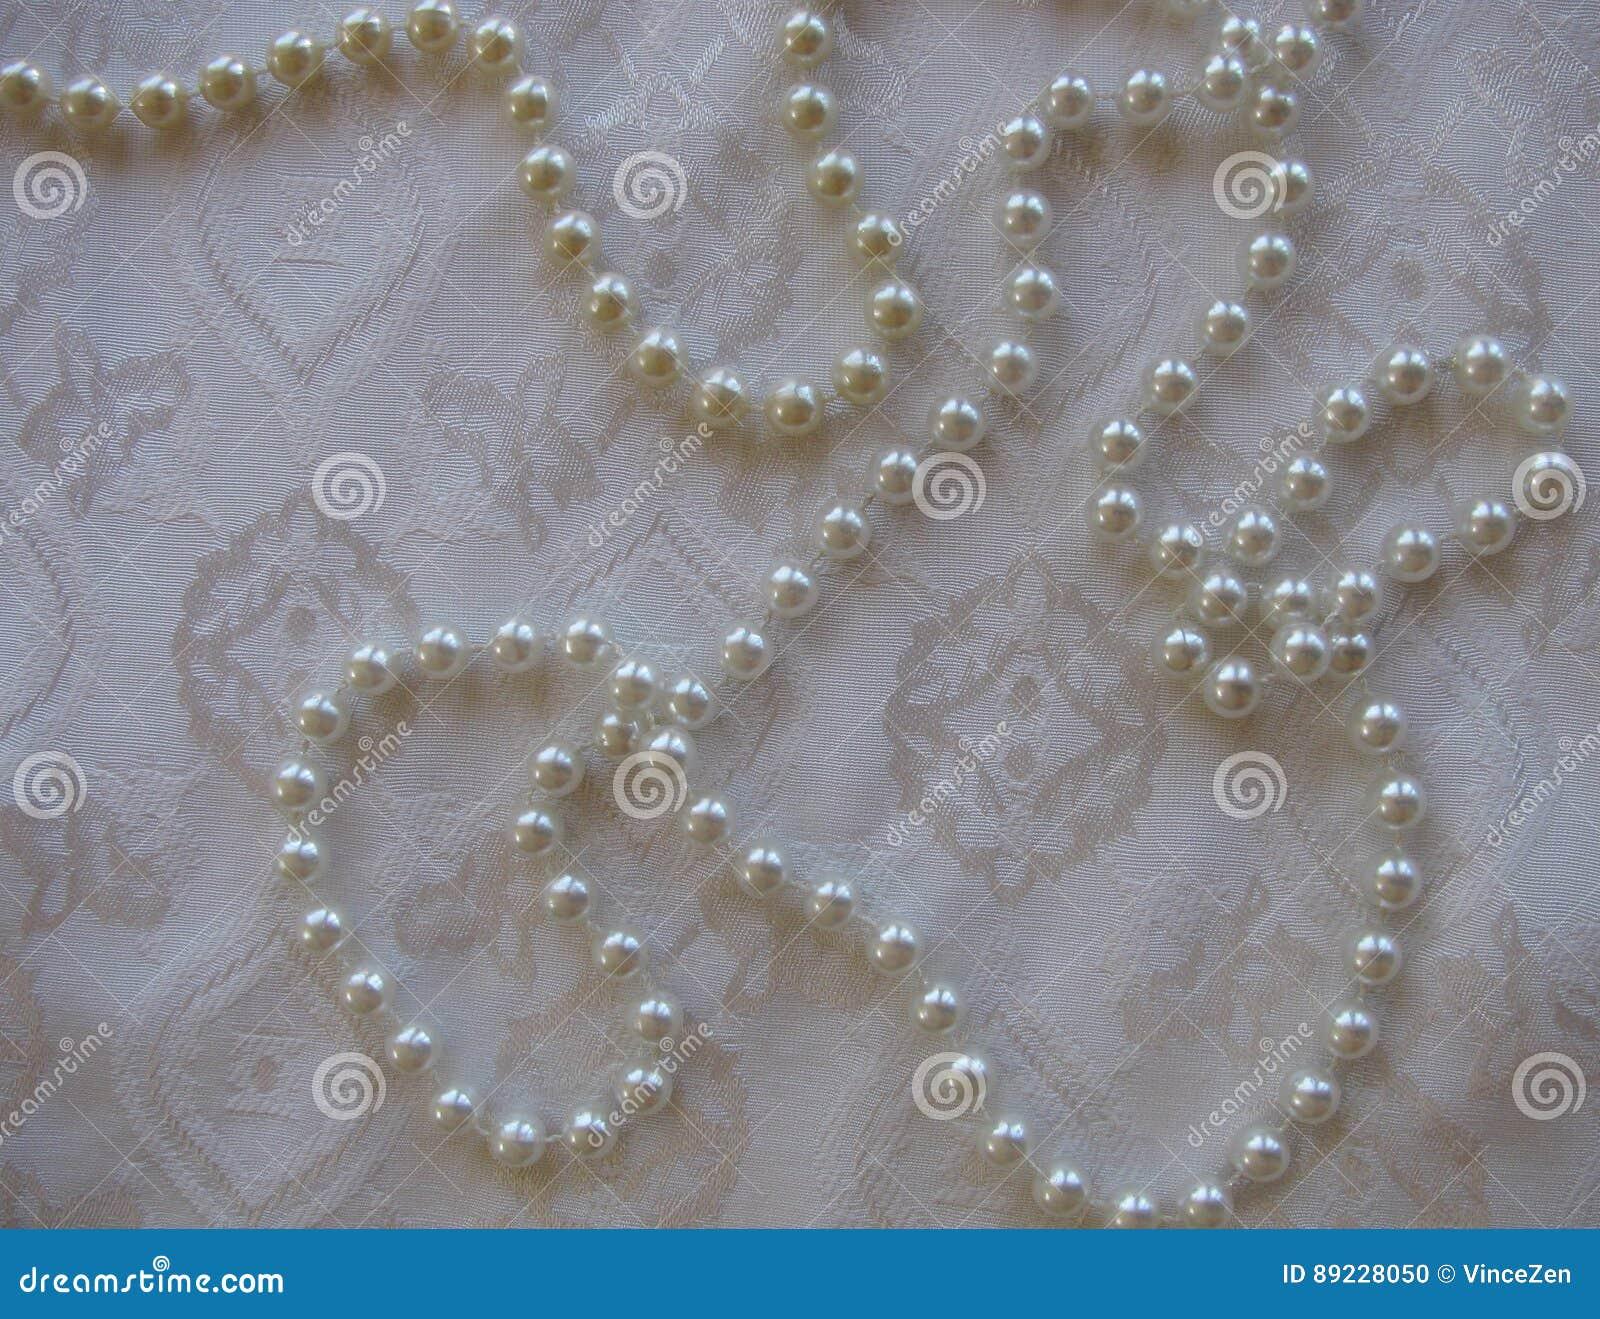 O fundo textured branco de pérolas brilhanteas no ricos modelou a tela